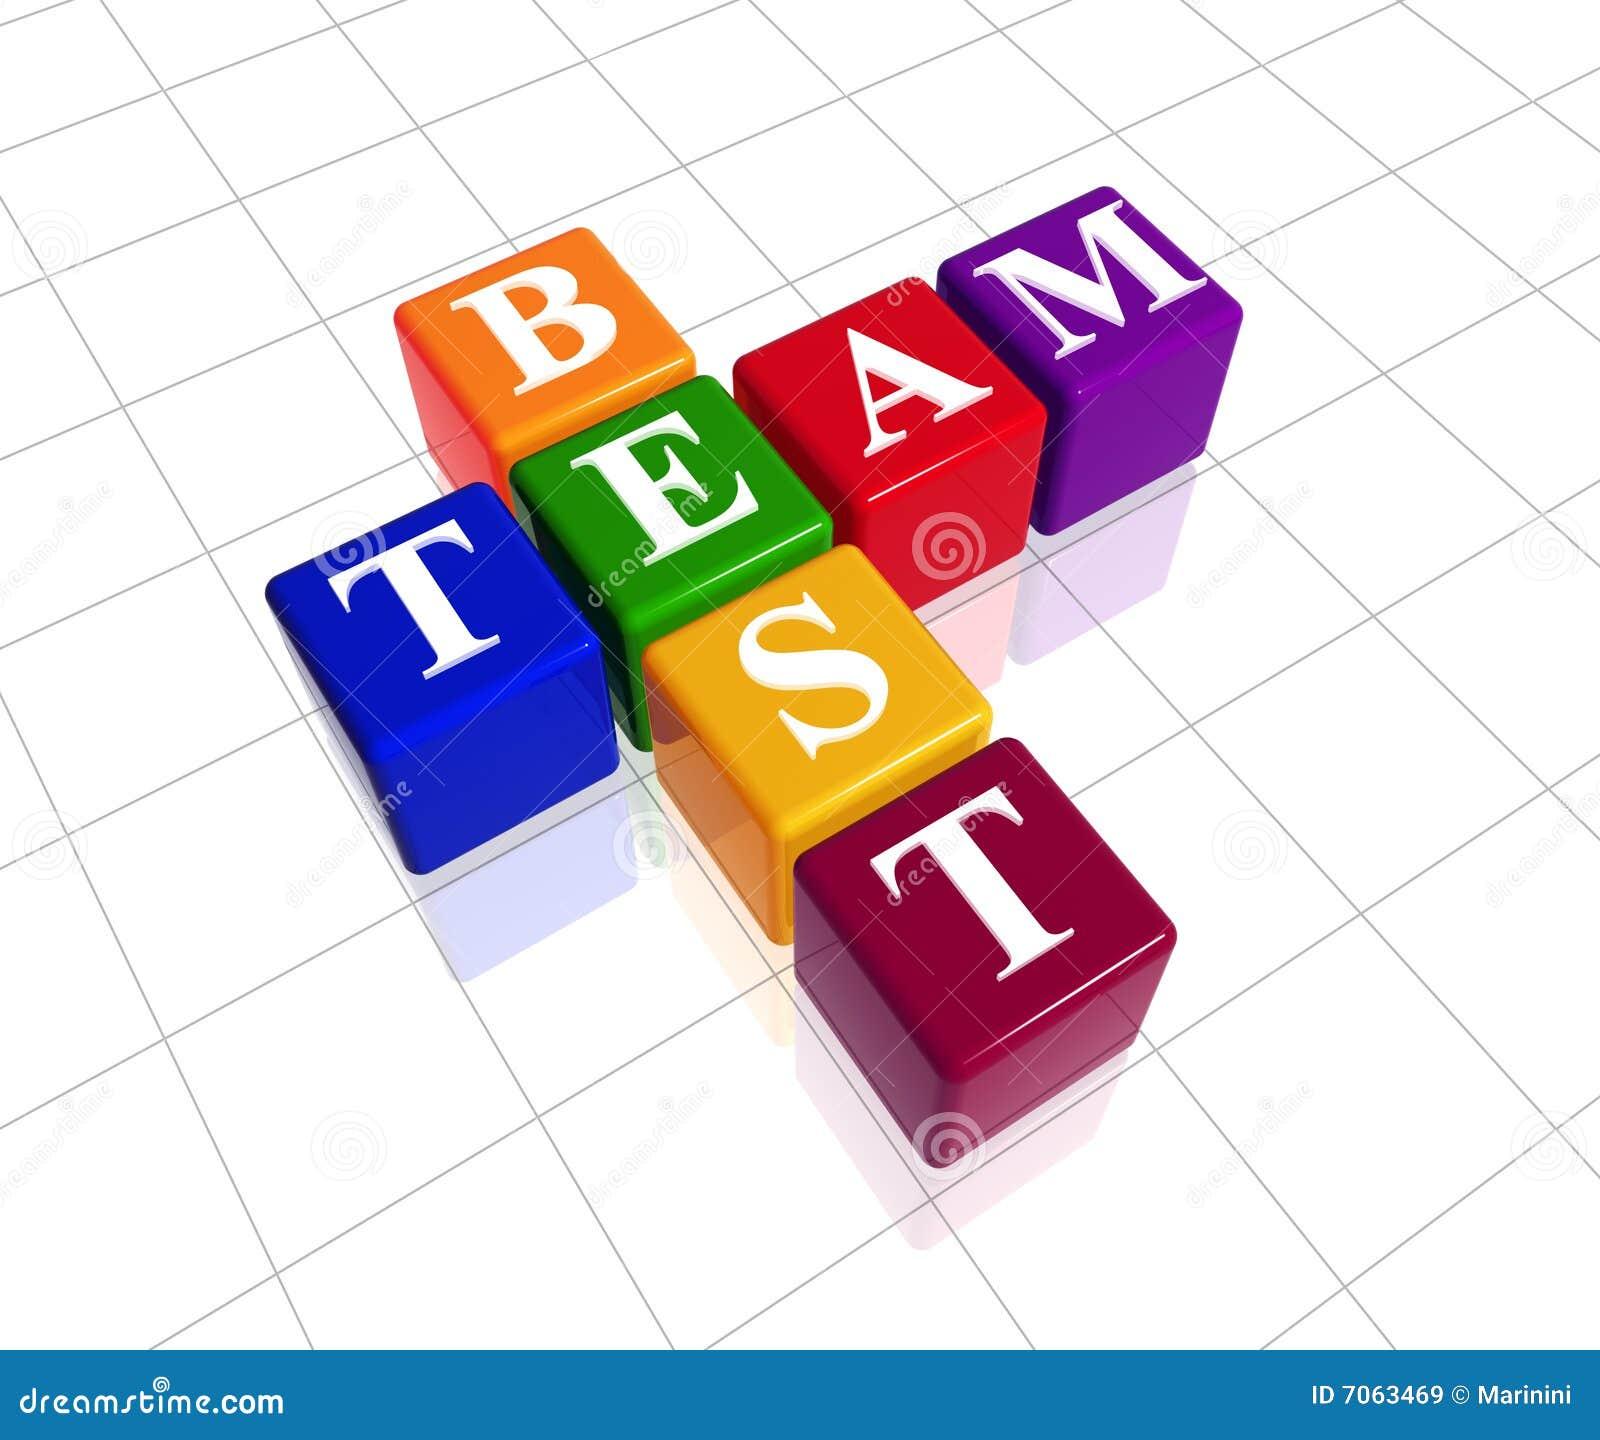 best team experience